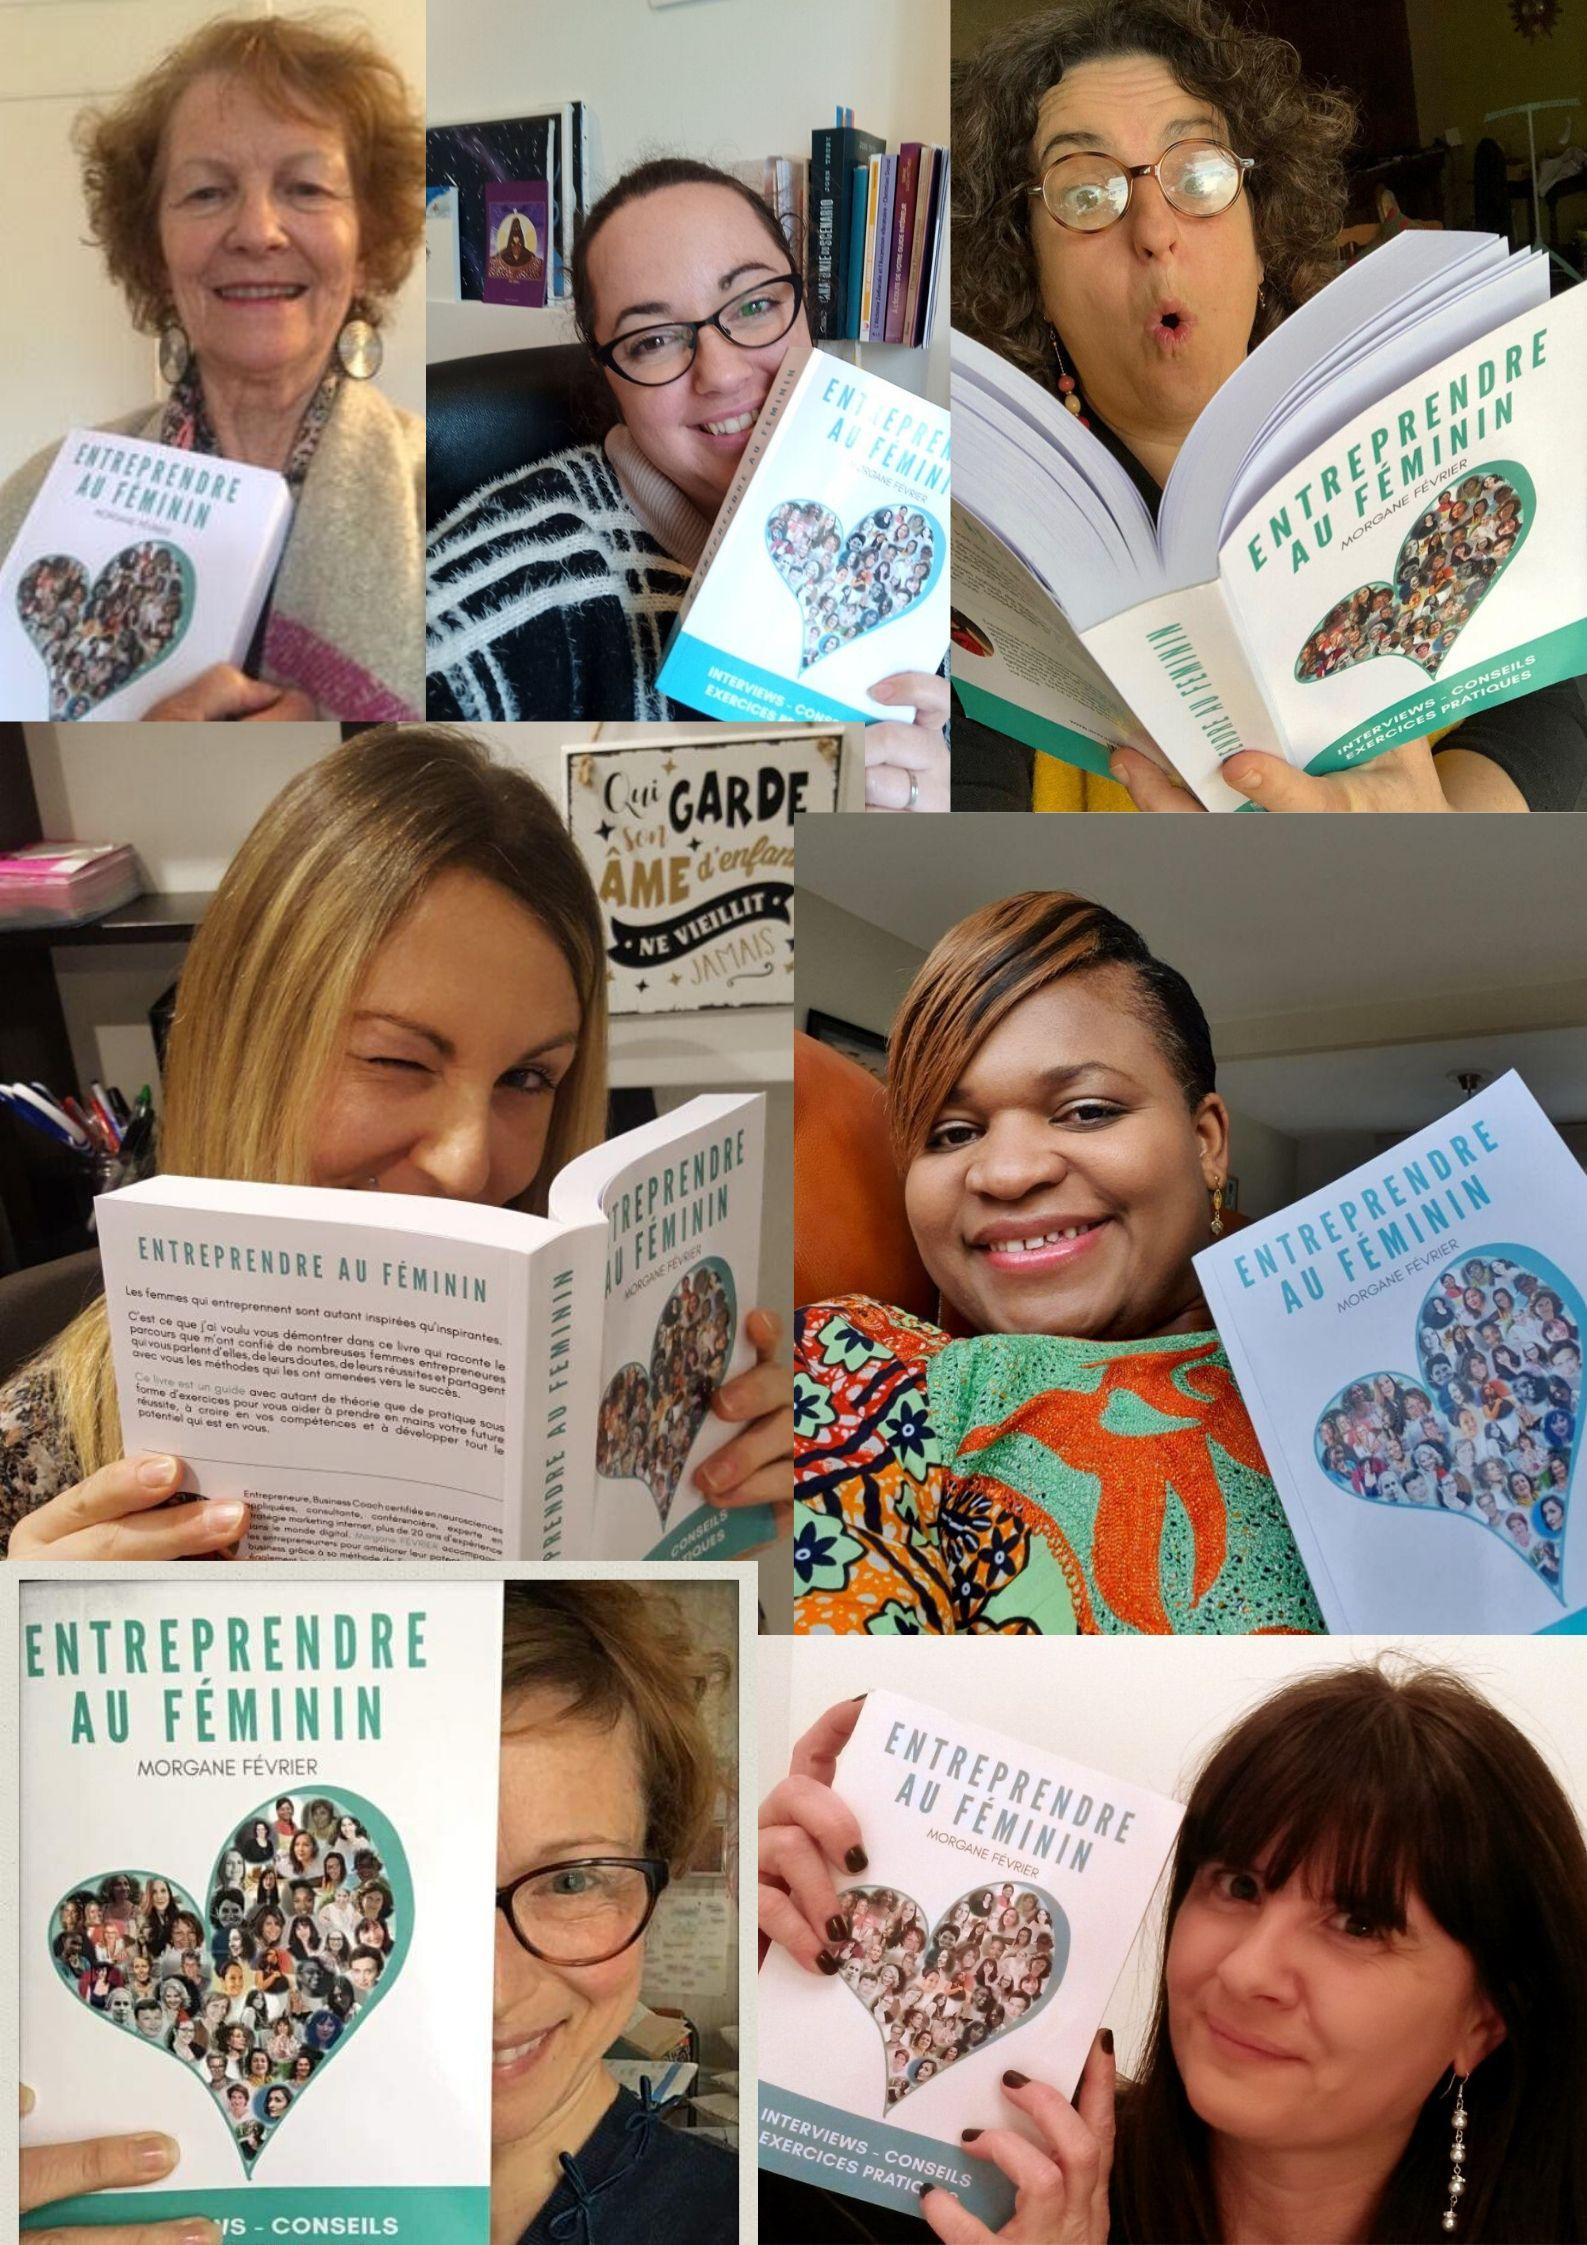 Entreprendre-au-feminin-livre-lectrice